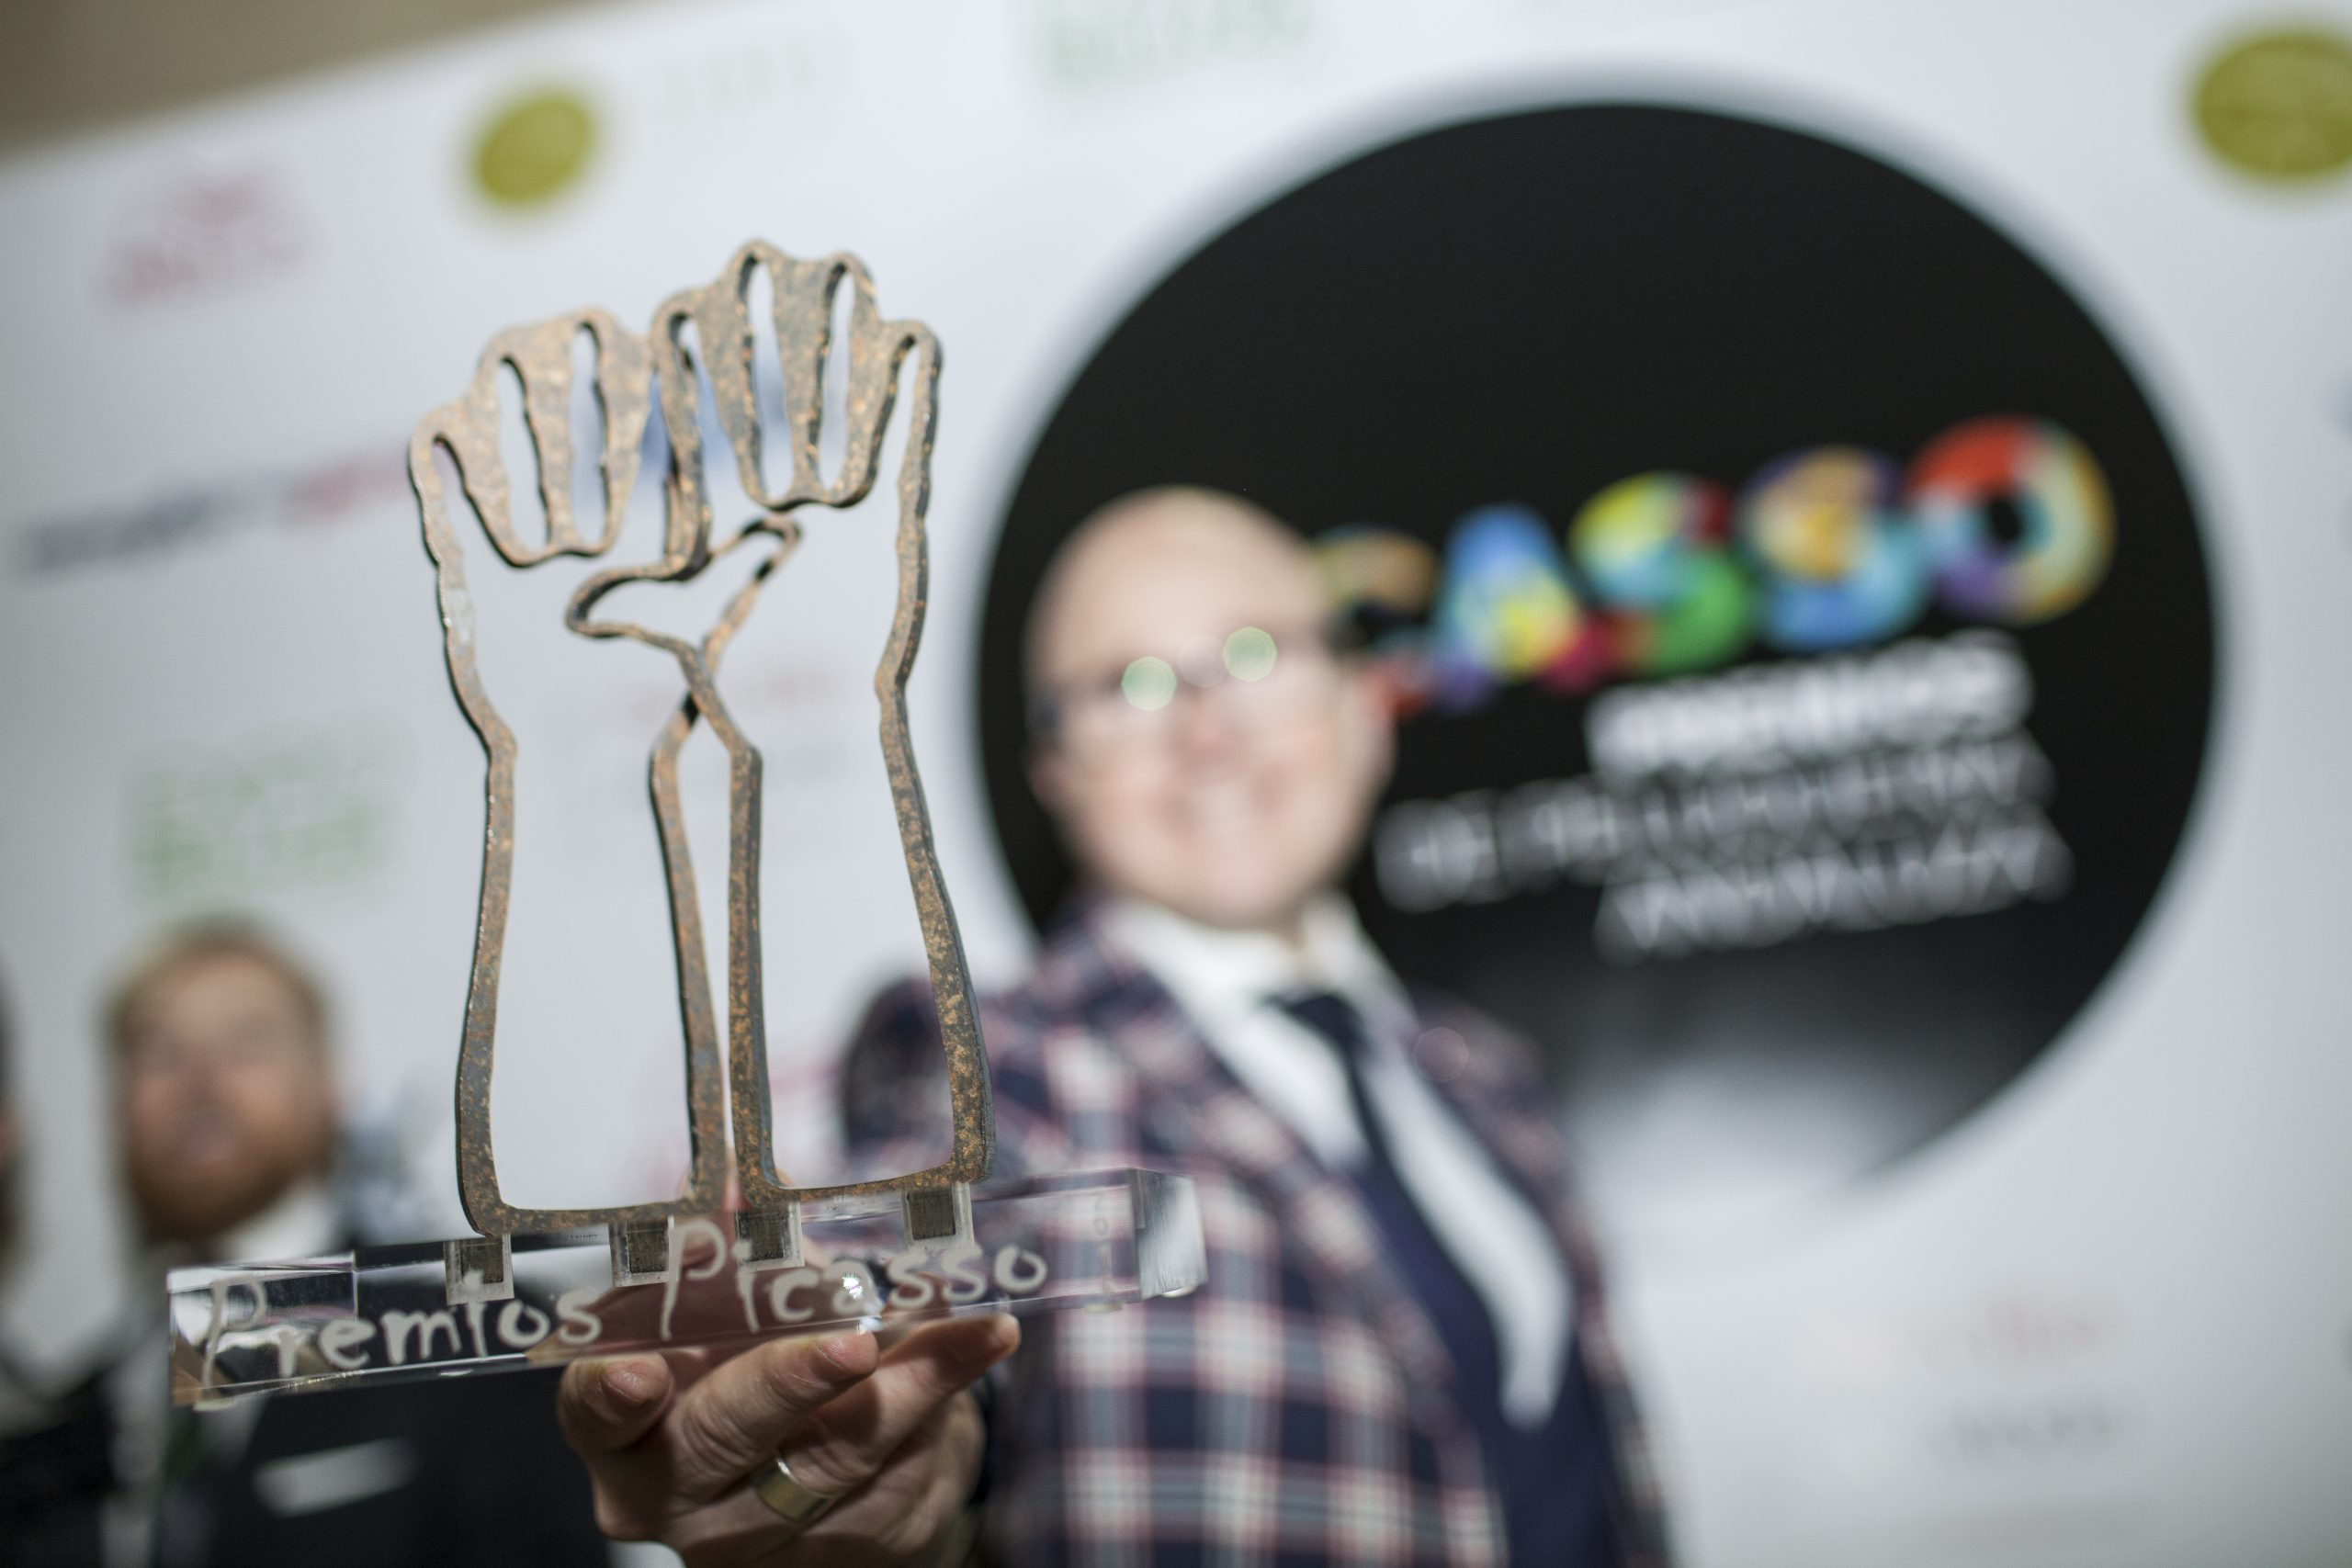 Premios Picasso 2016 scaled